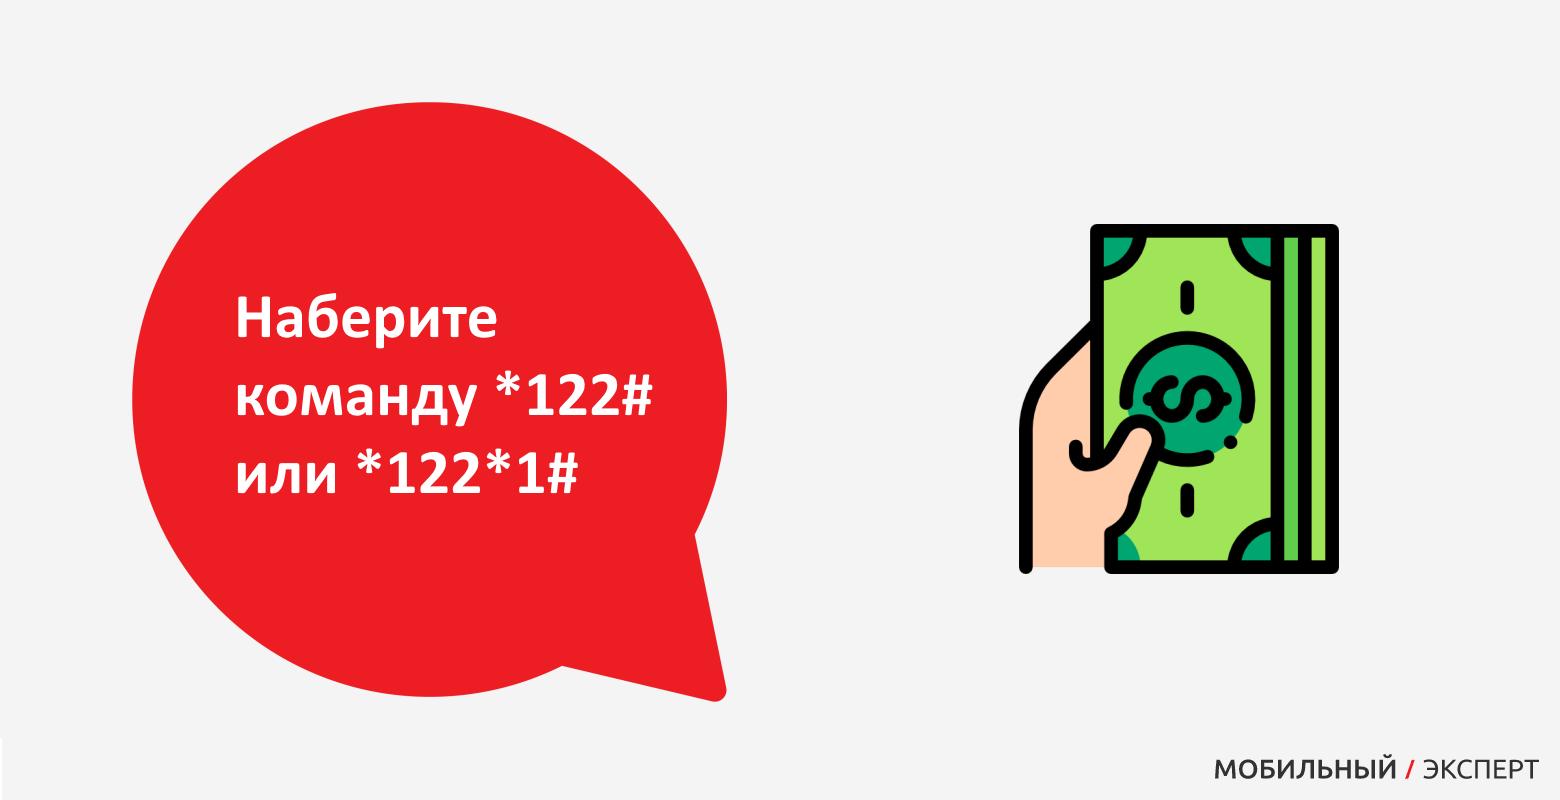 Наберите команду *122# или *122*1#